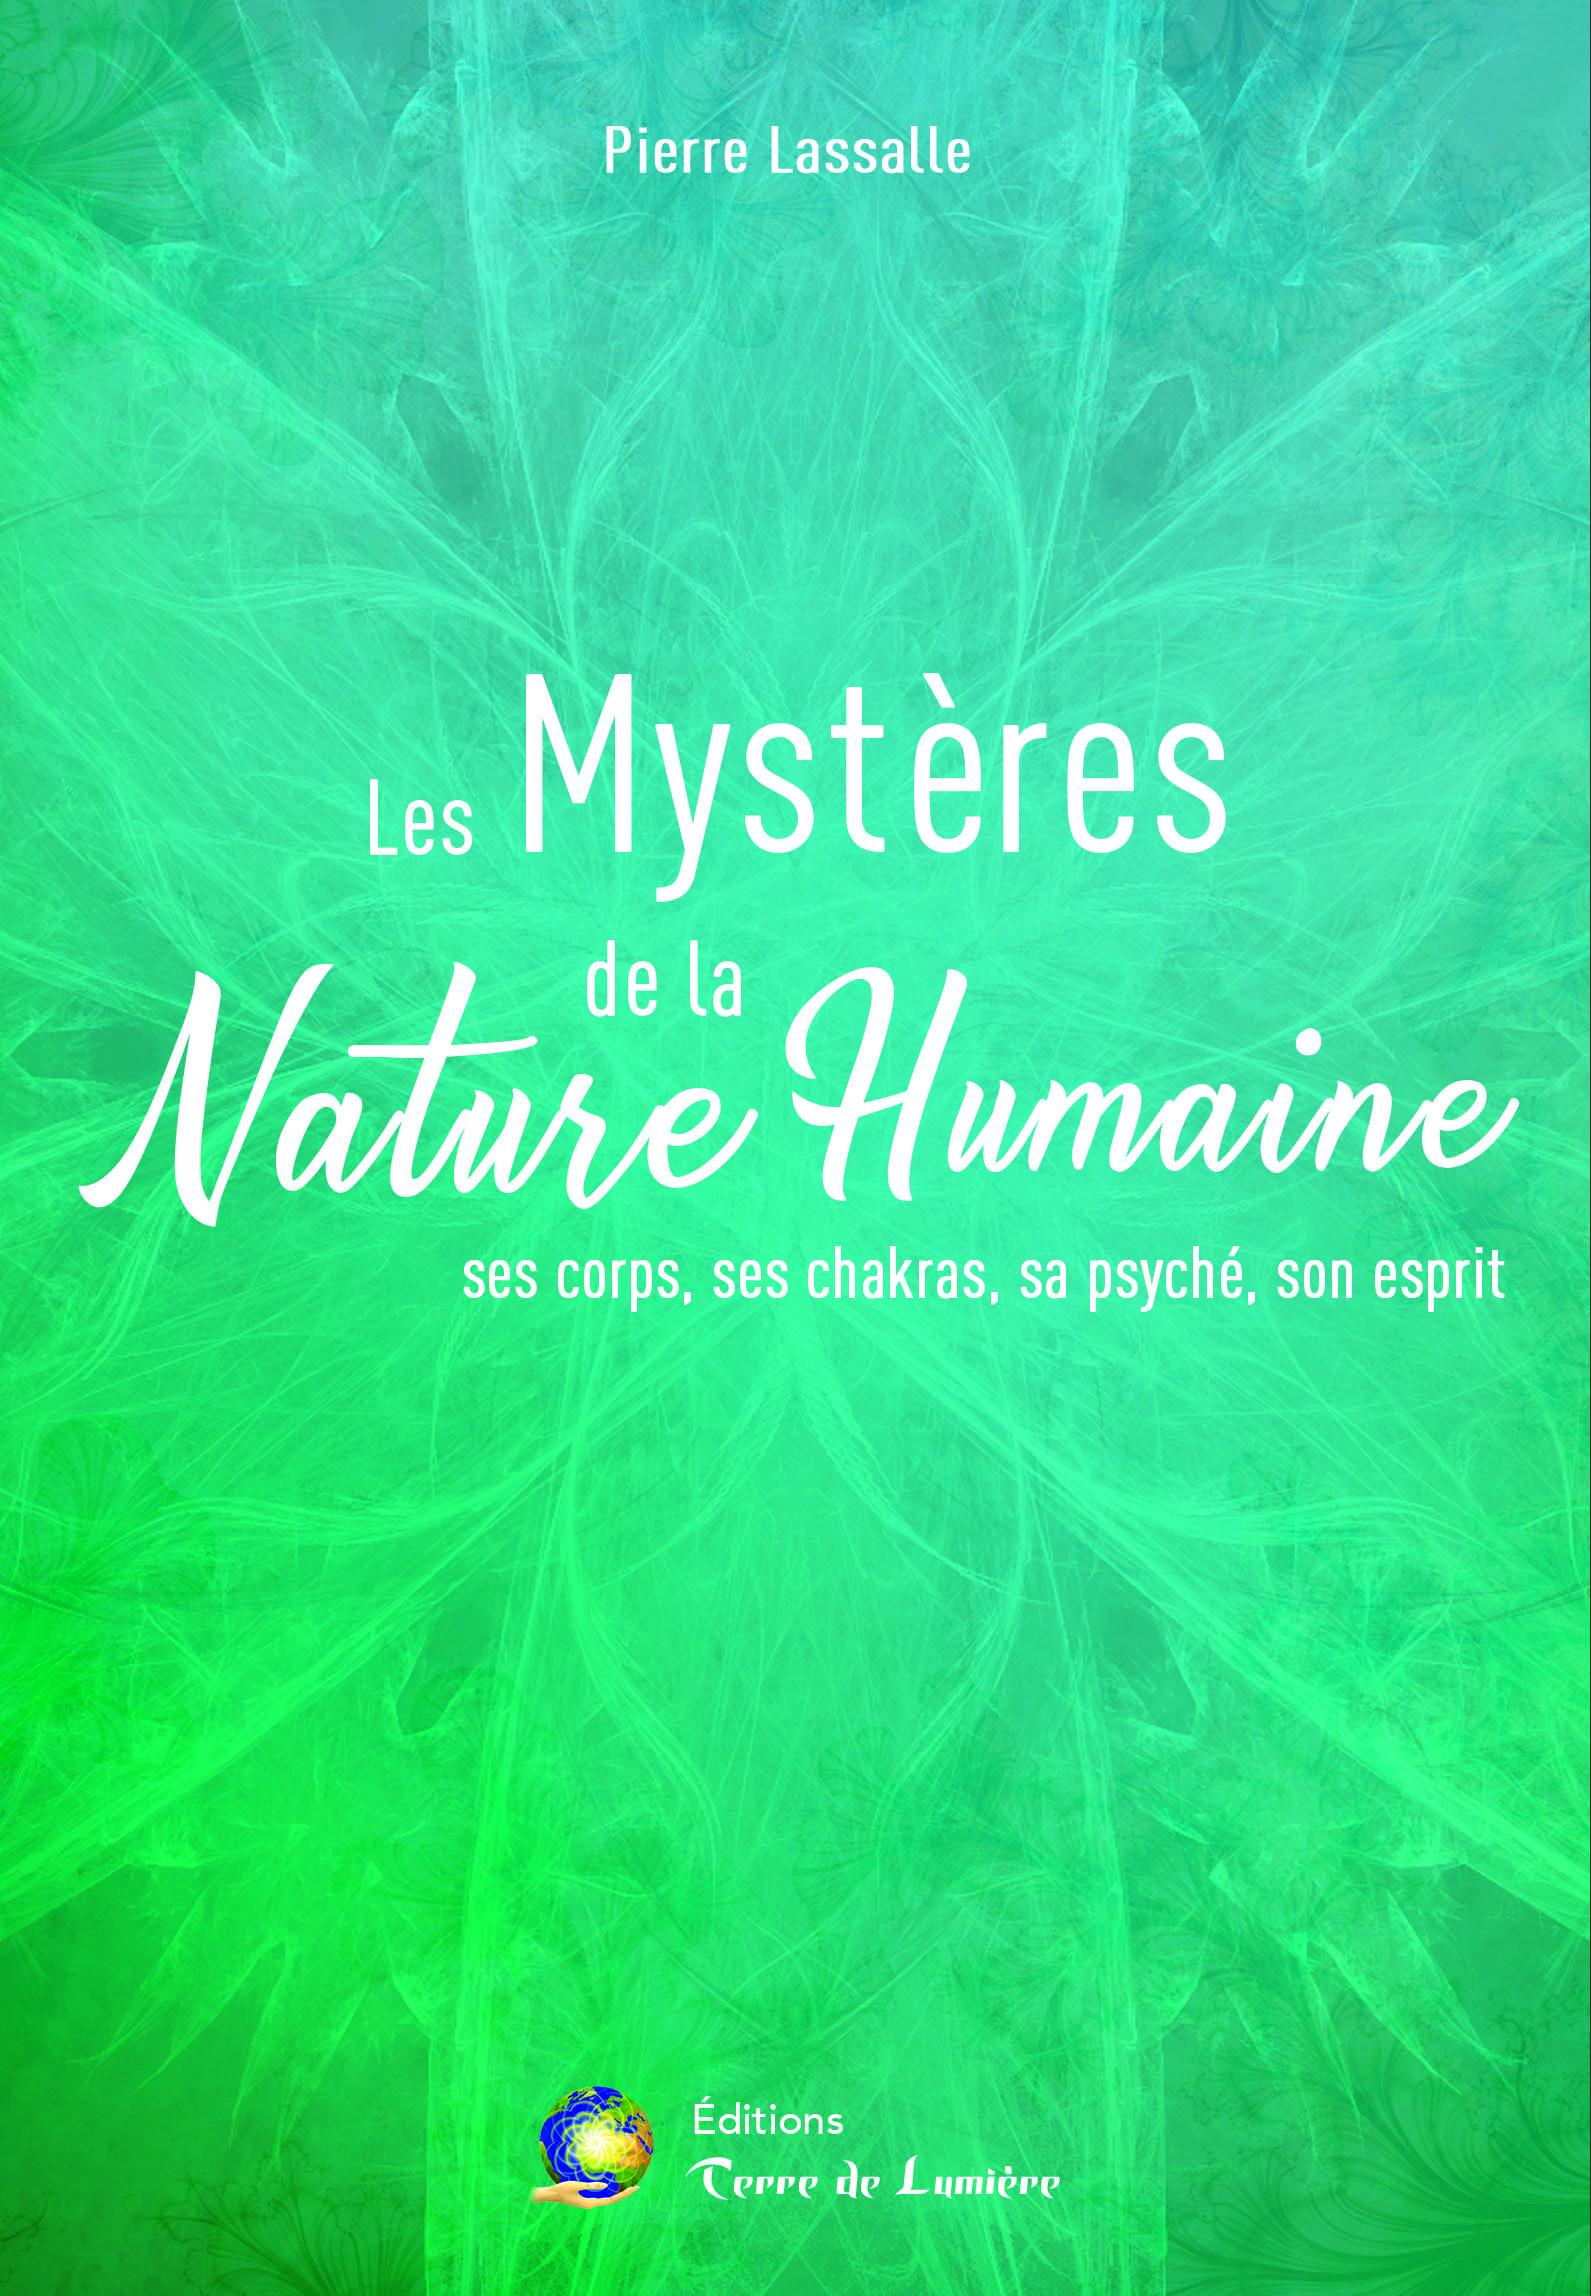 LES MYSTERES DE LA NATURE HUMAINE - SES CORPS, SES CHAKRAS, SA PSYCHE, SON ESPRIT